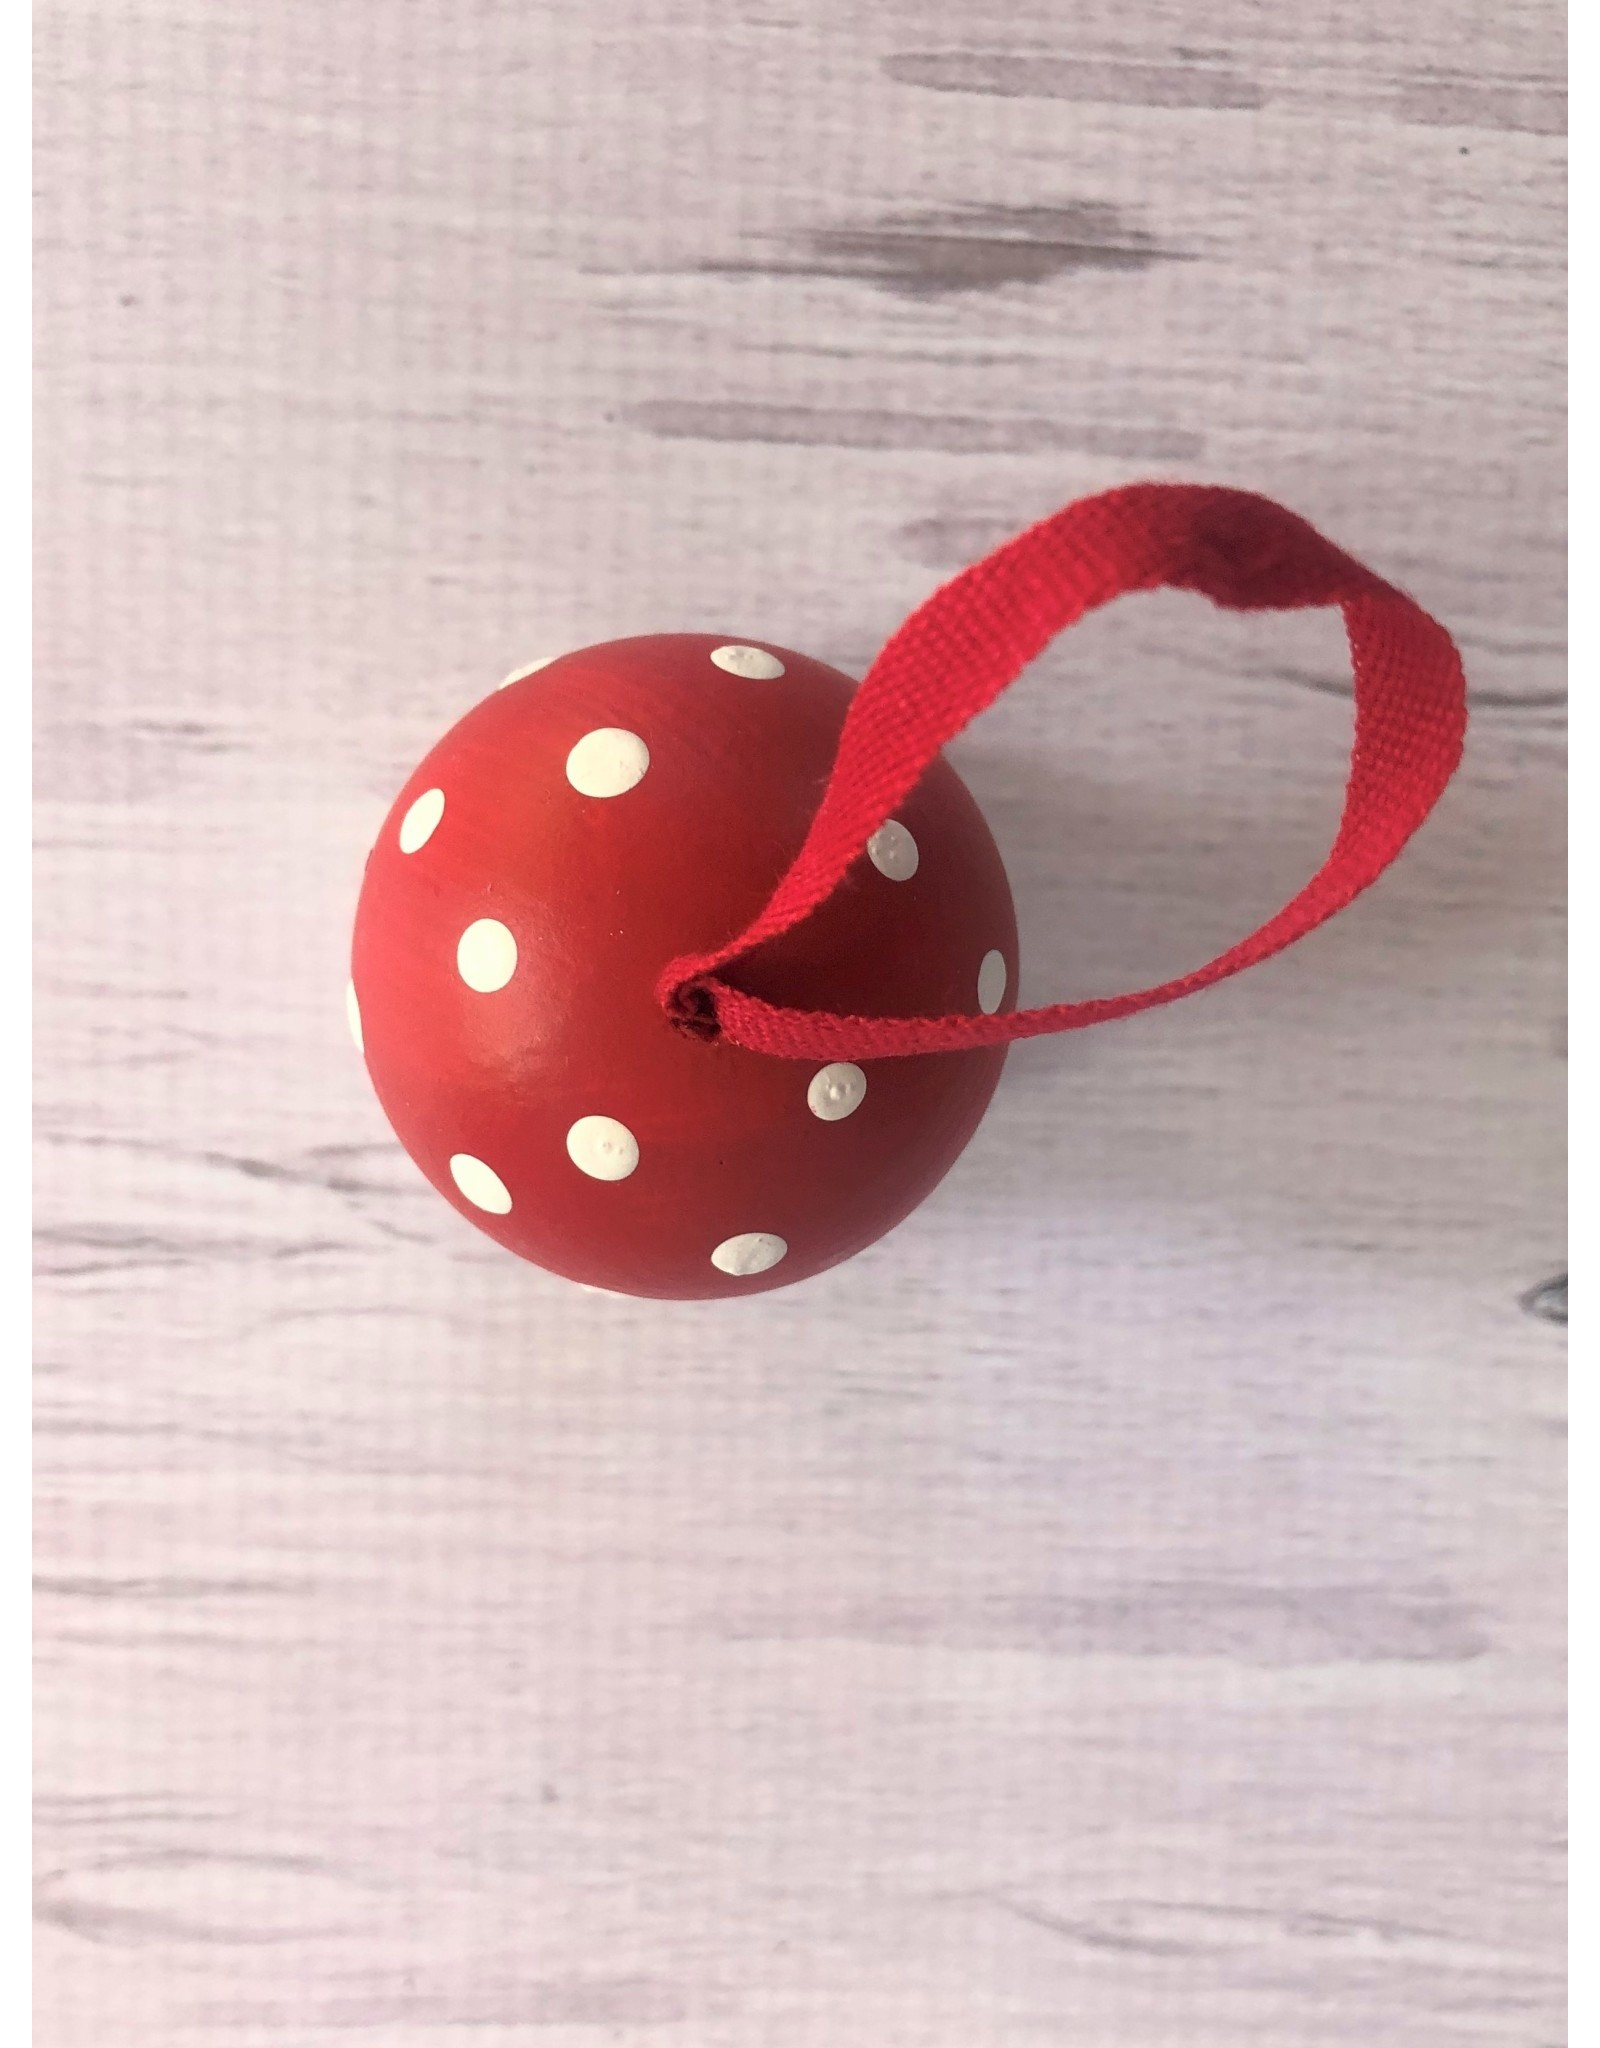 Red Toadstool Mushroom Ornament